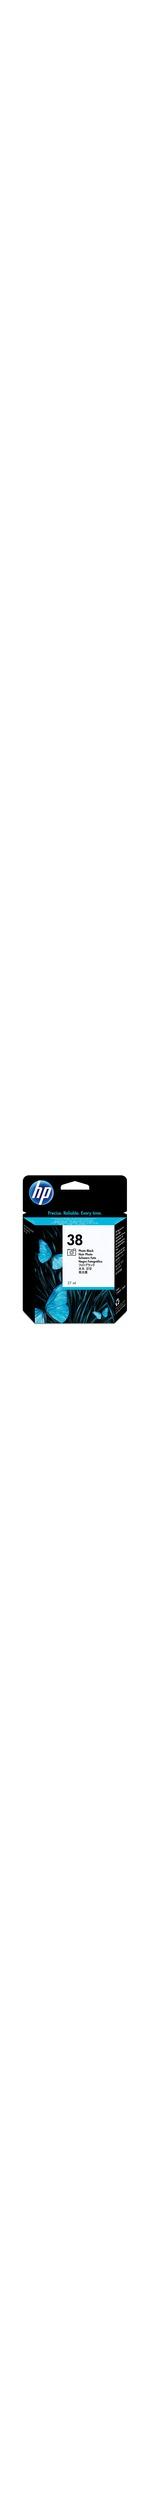 HP C9413A Ink Cartridge - Photo Black